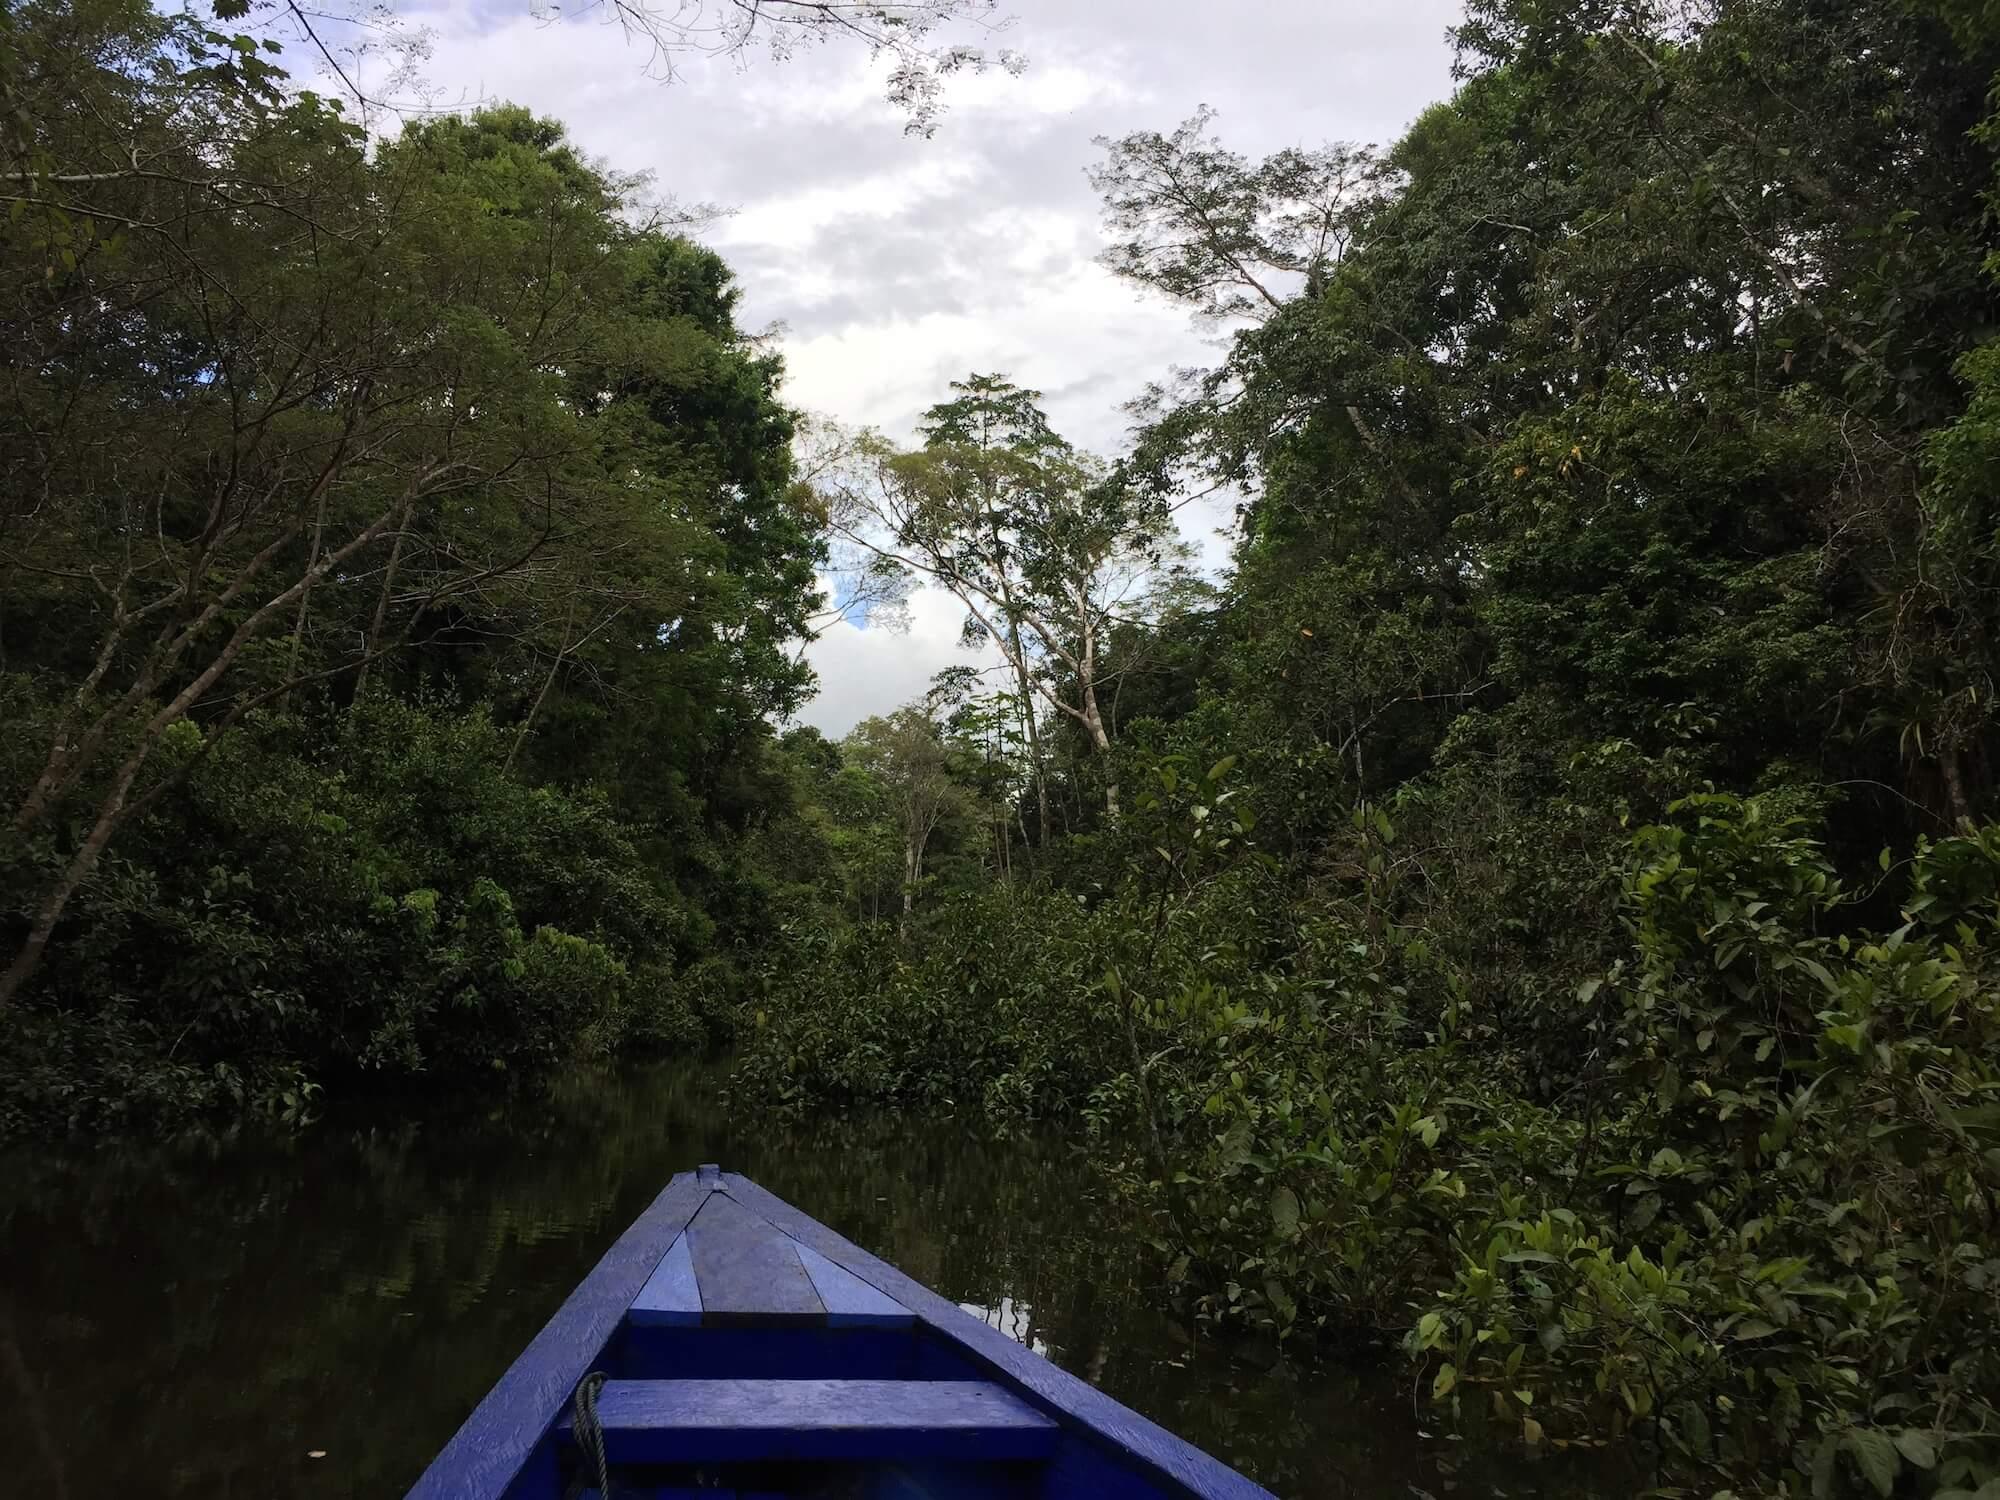 Amazon-tributary-river-Peruvian-jungle.JPG